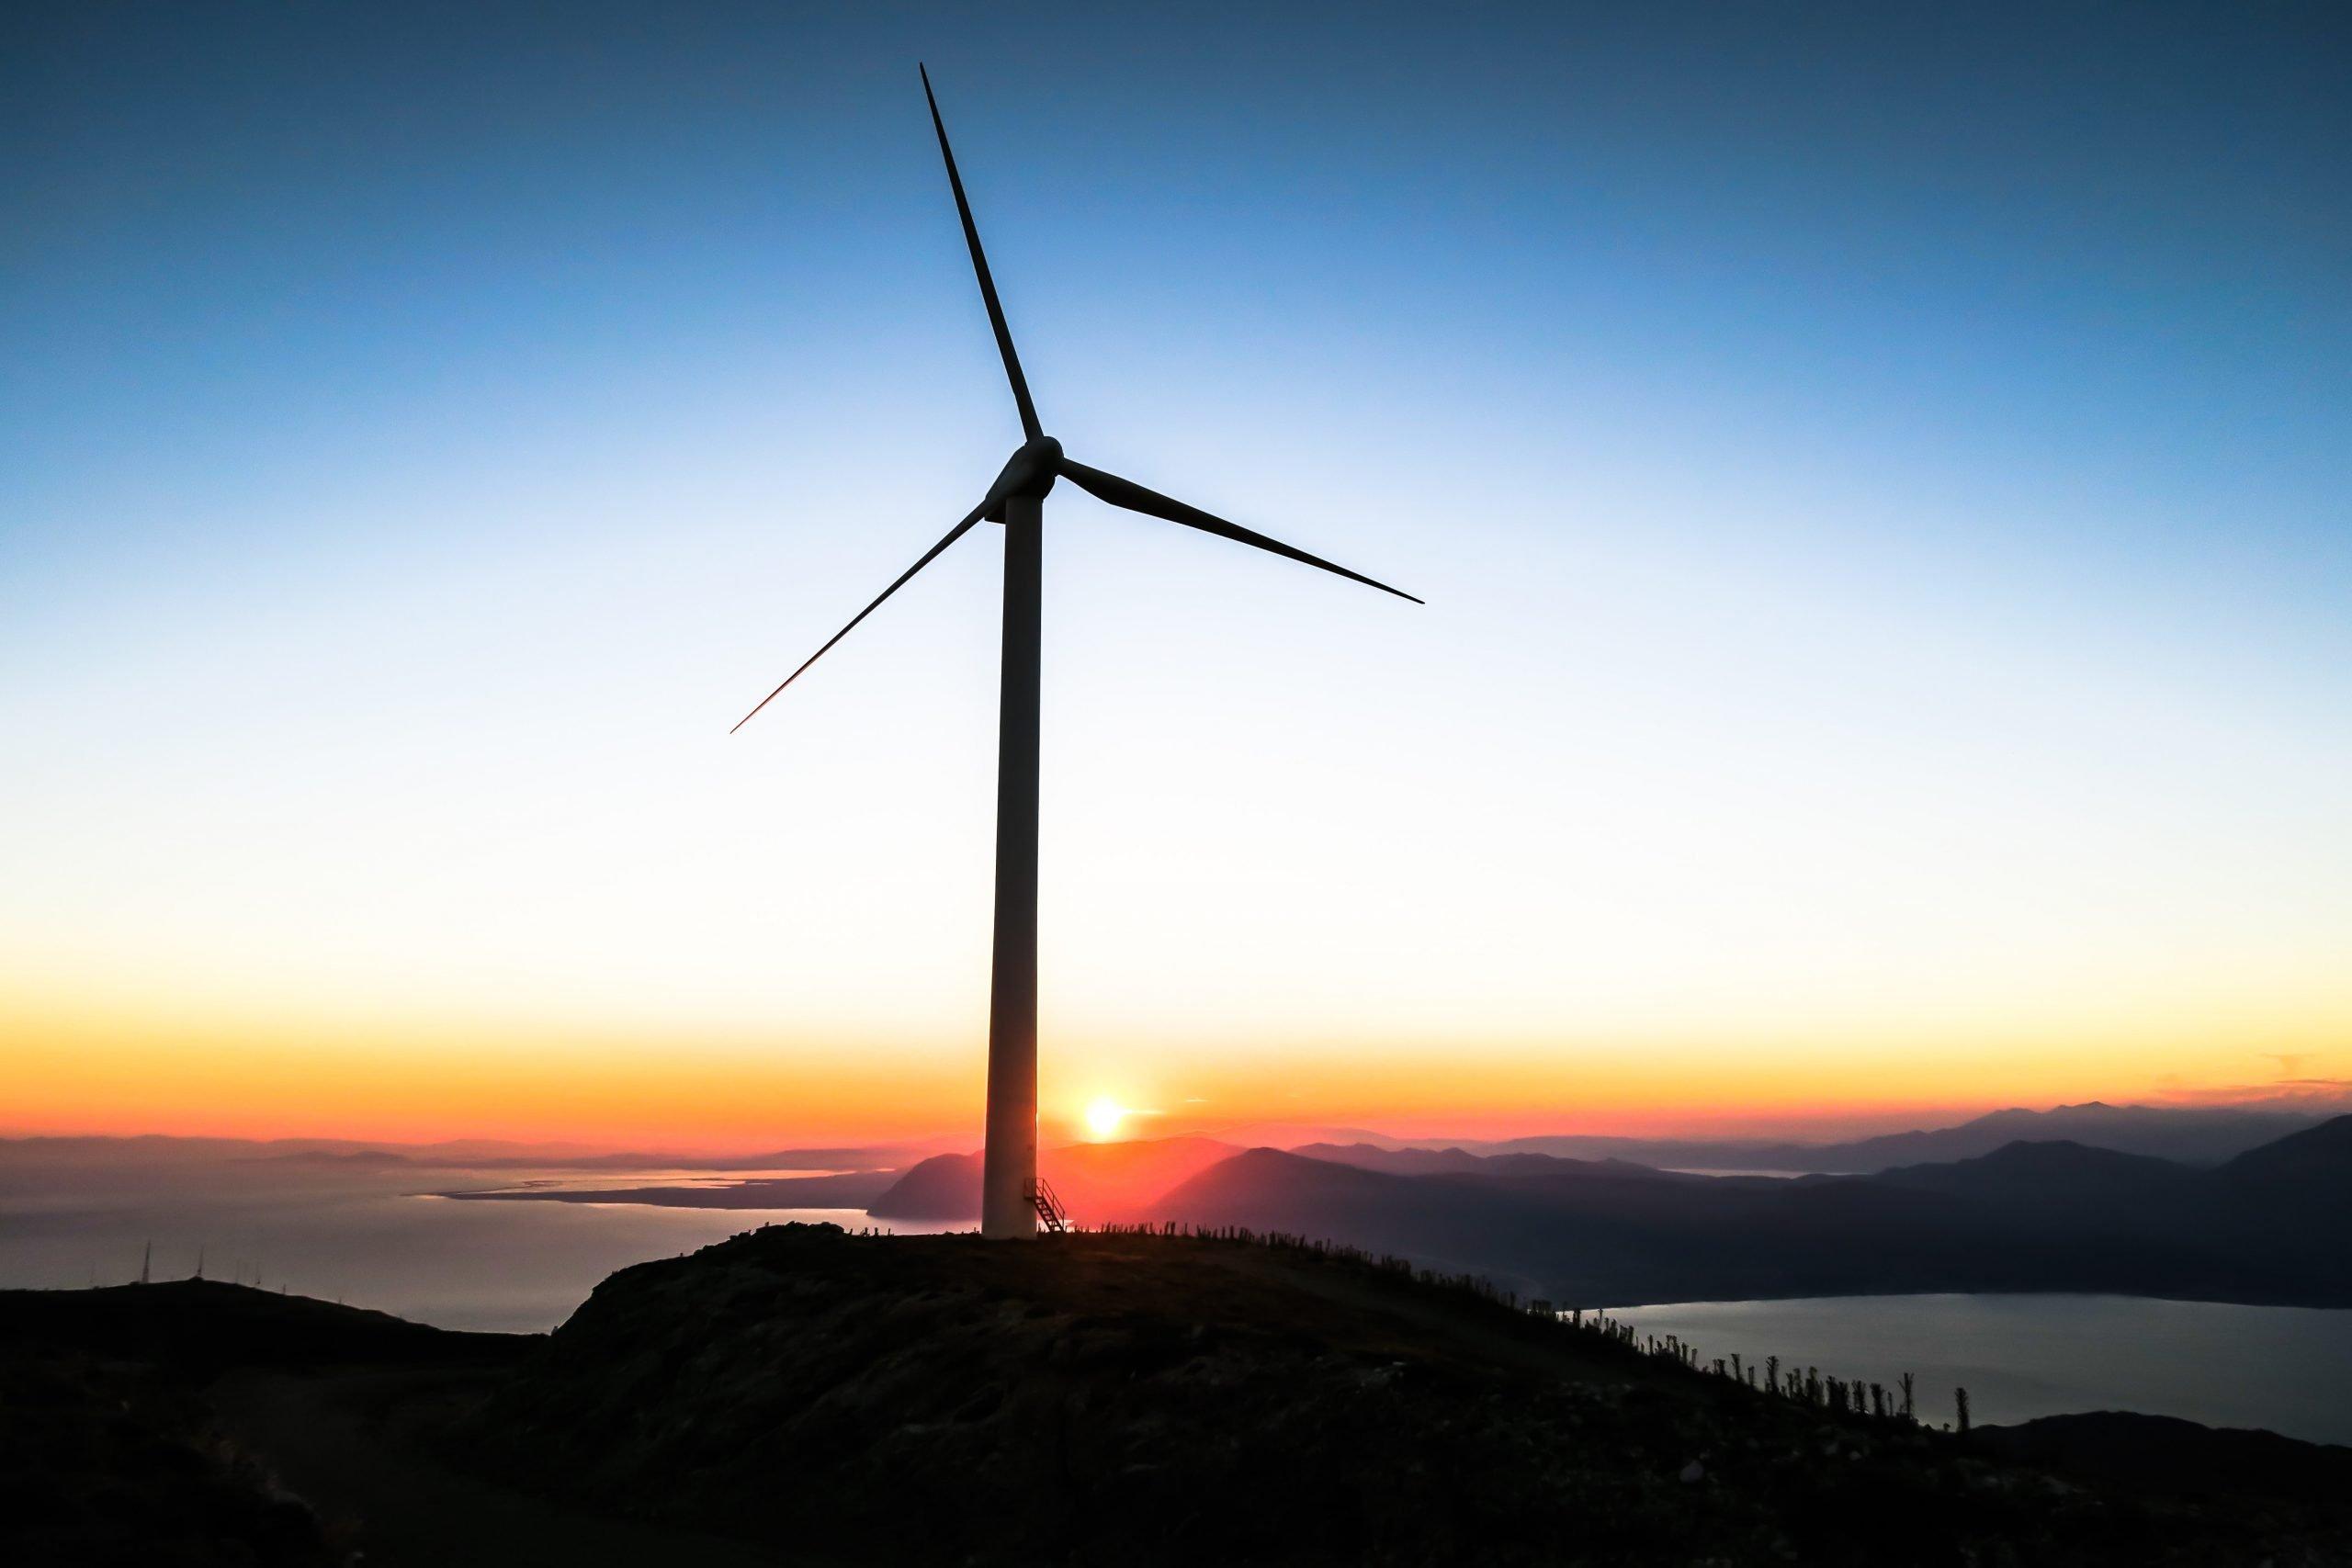 Maintaining Bullish View; Financials and Energy Upgraded